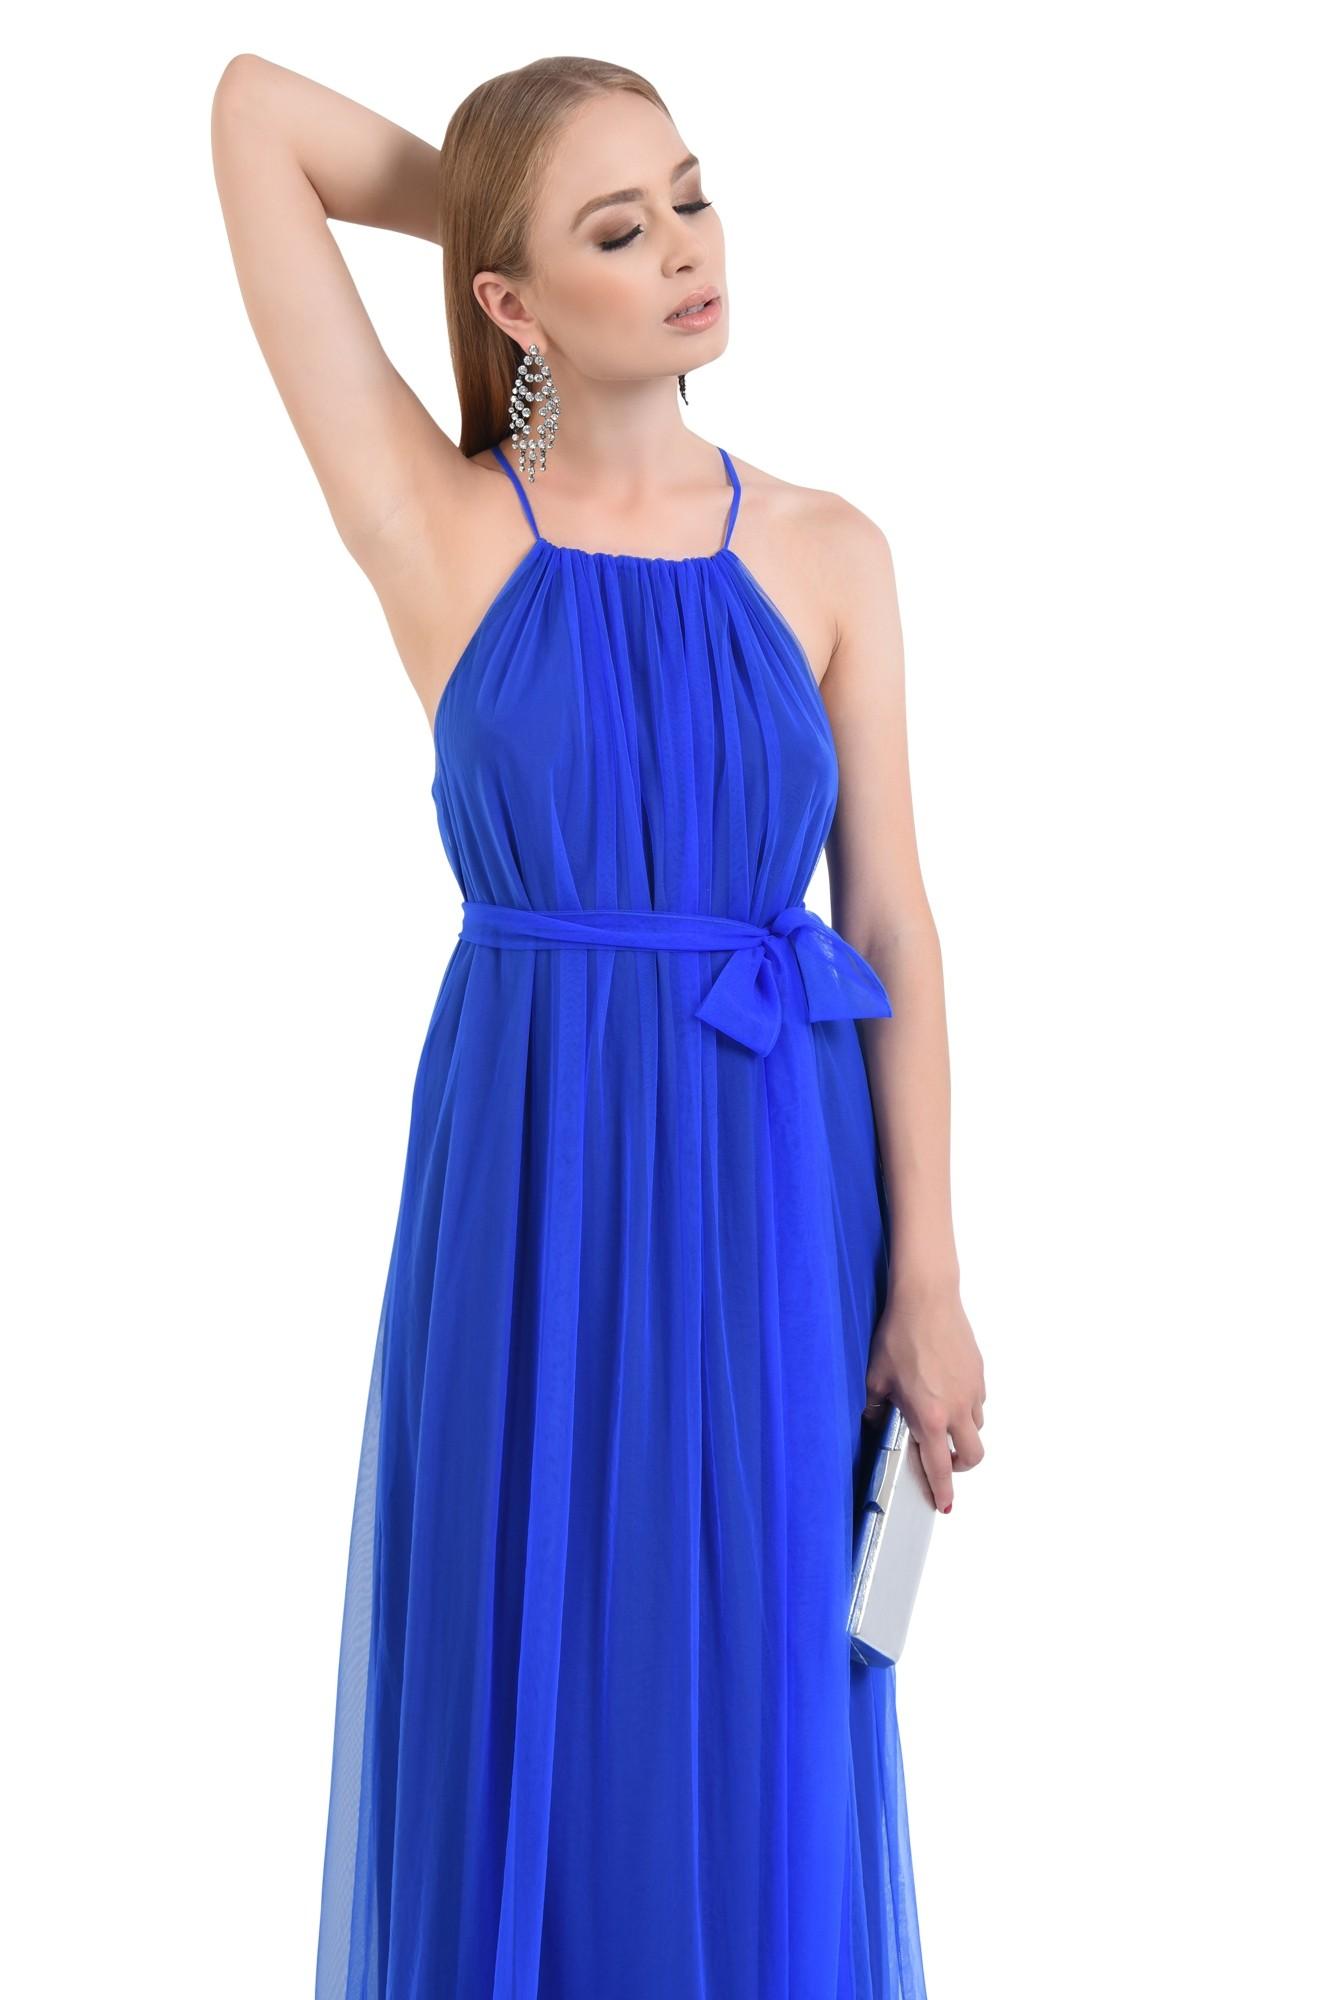 0 - rochie de ocazie, tul, lunga, albastru